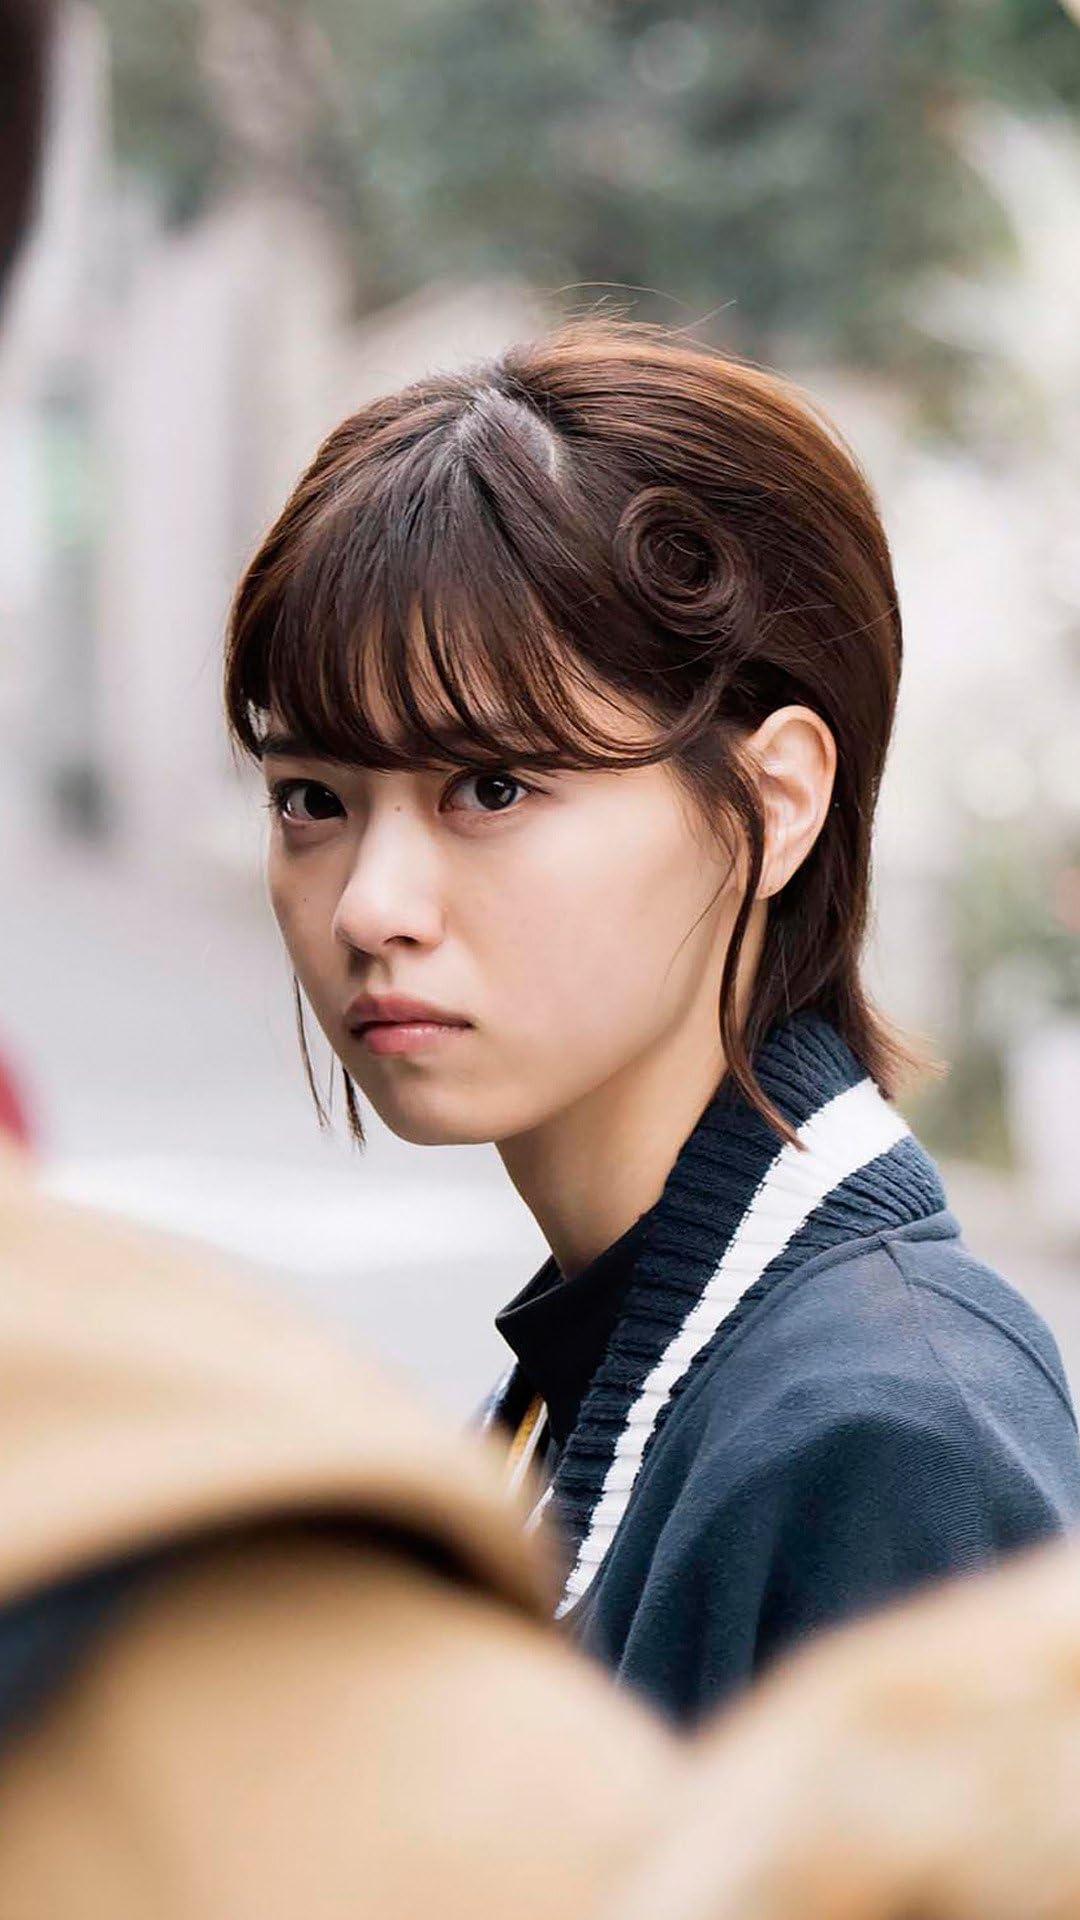 乃木坂46 フルhd 1080 1920 スマホ壁紙 待受 電影少女 Video Girl Ai